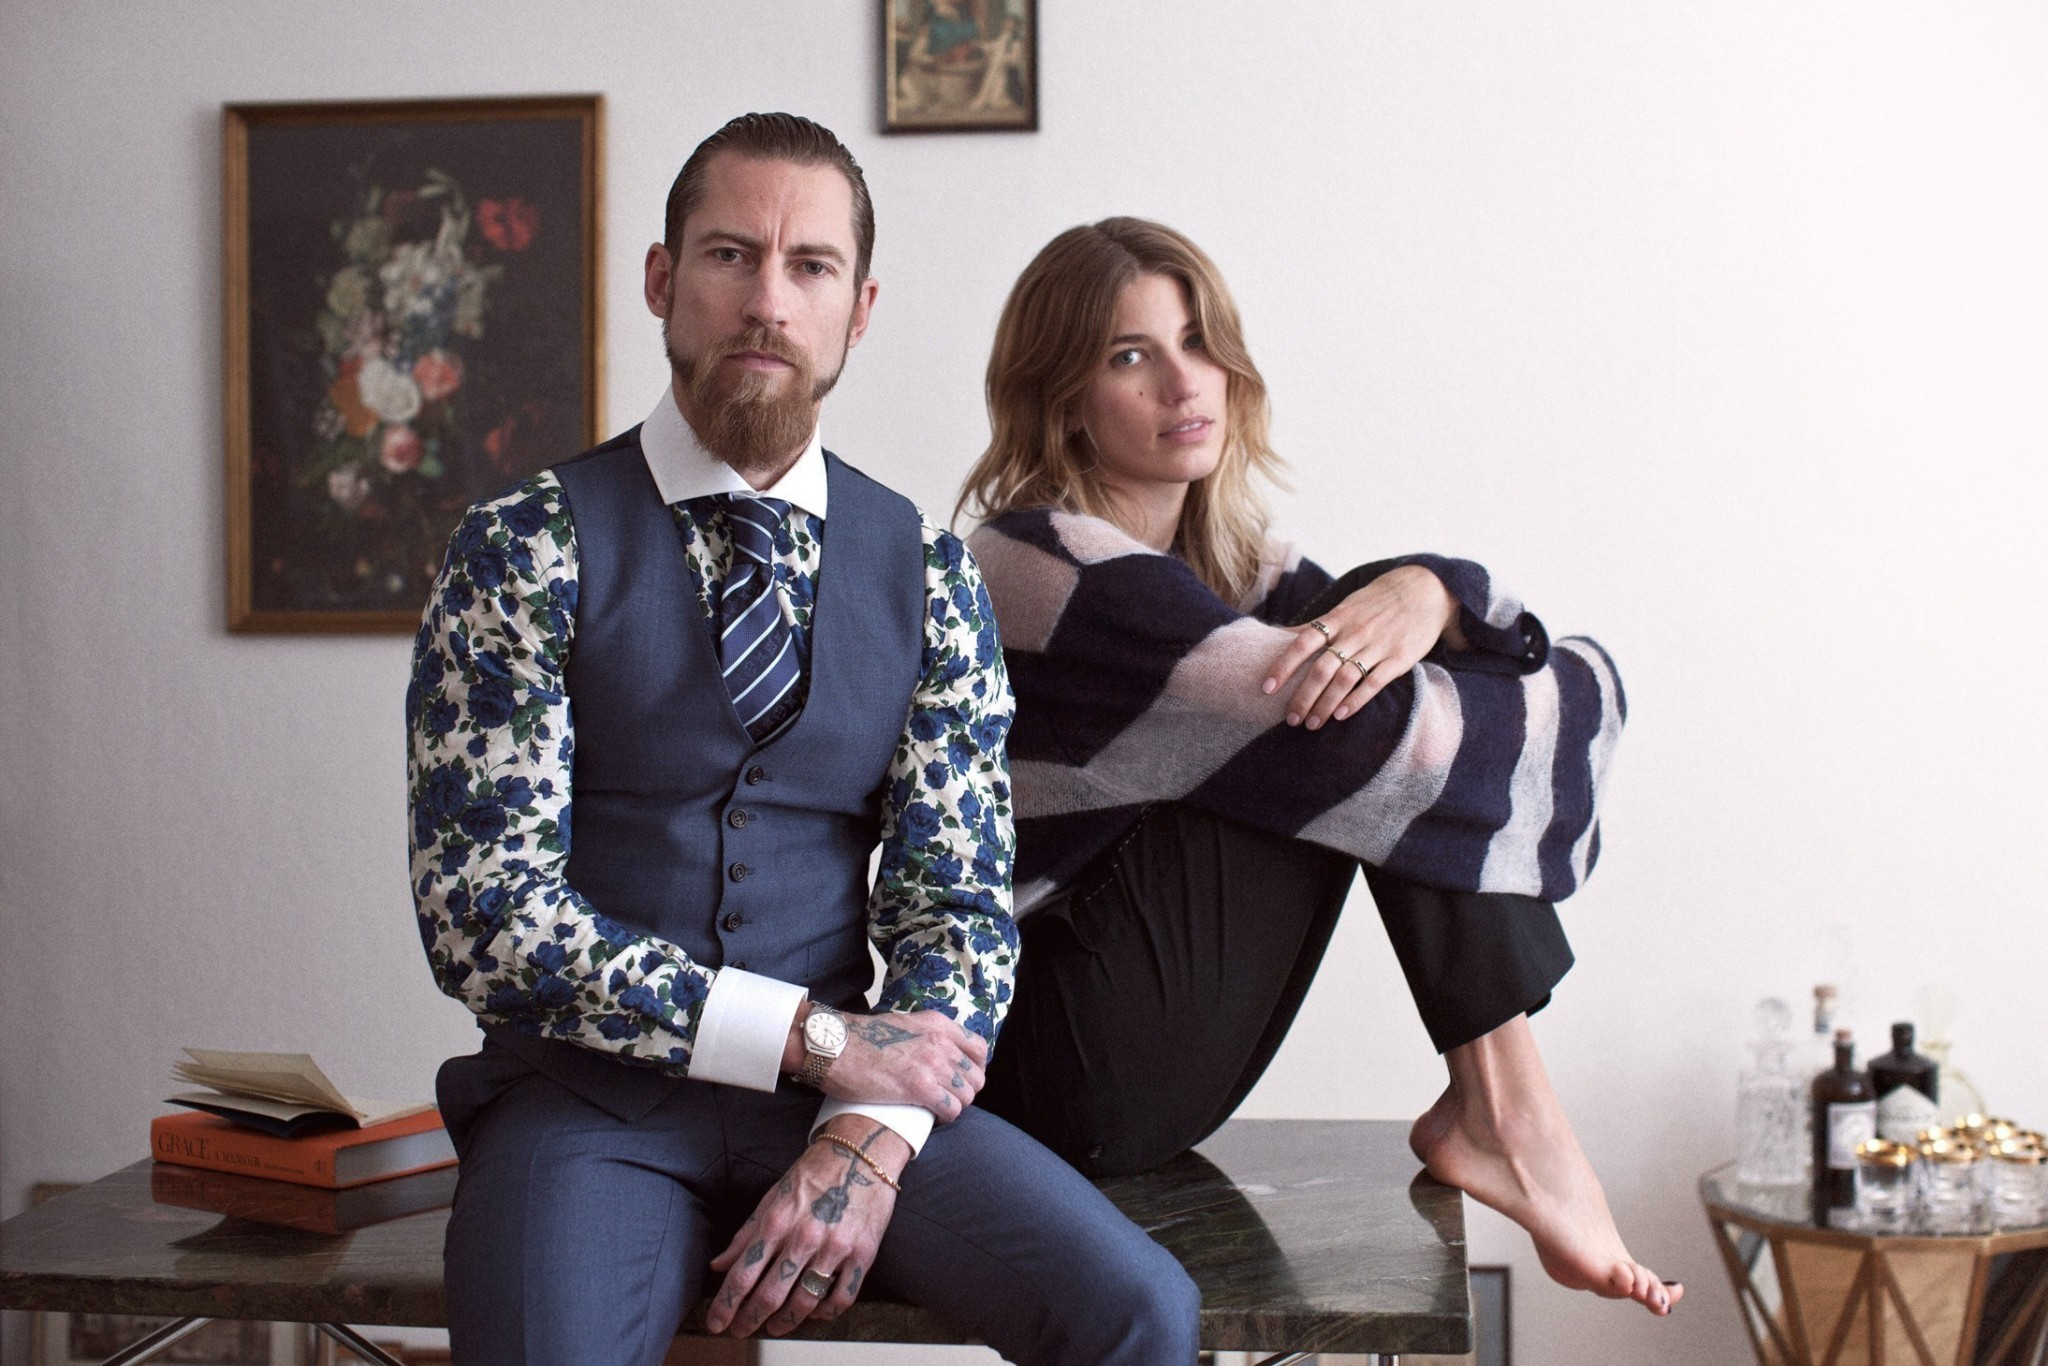 Iconic_Couples_VeronikaHeilbrunner_JustinOSheea_Fabulous_Muses_2